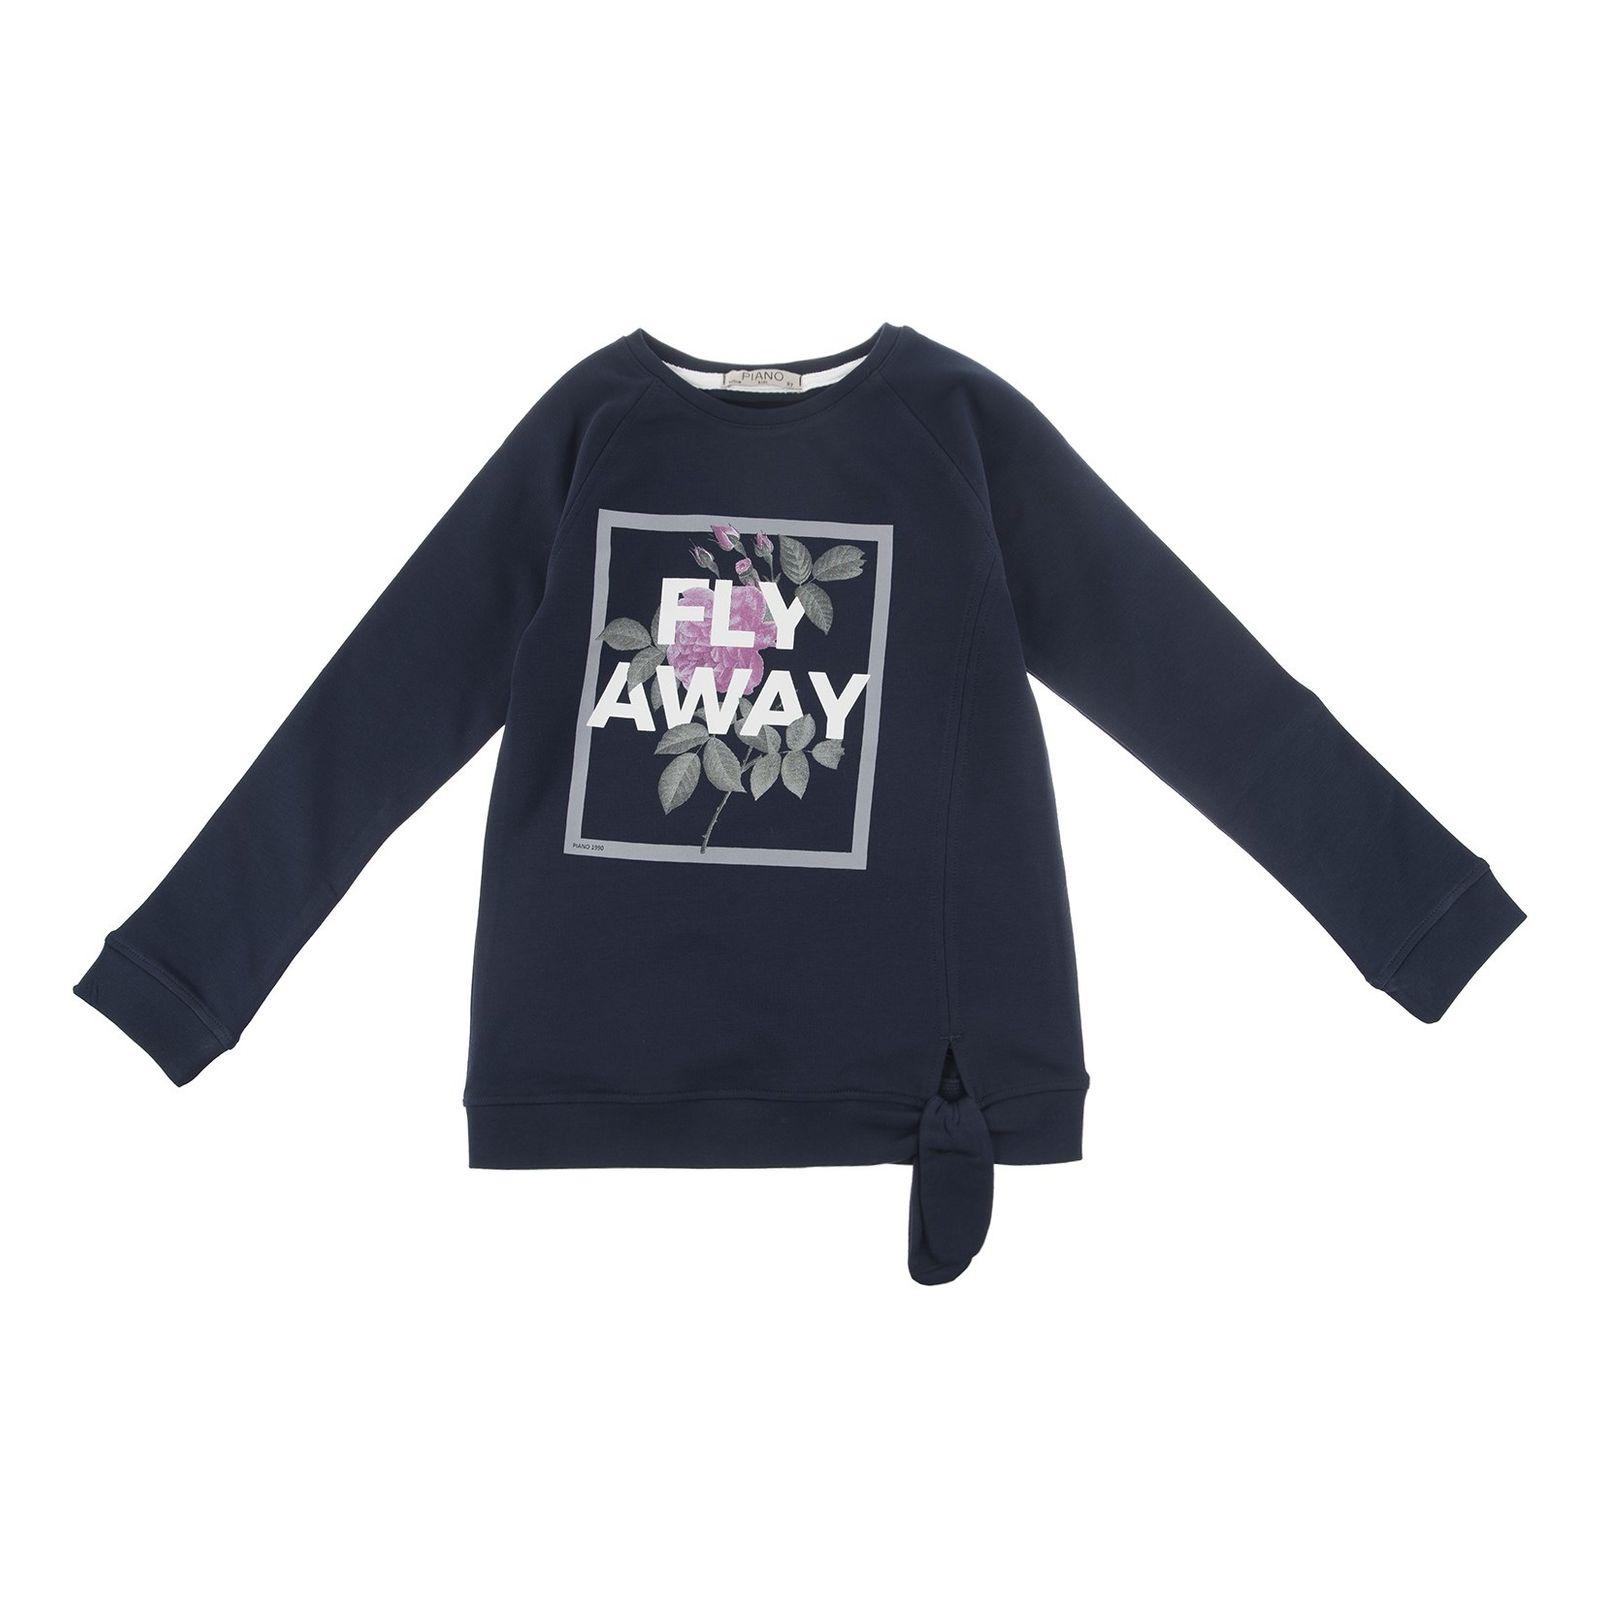 تی شرت نخی دخترانه - پیانو - آبي تيره  - 1